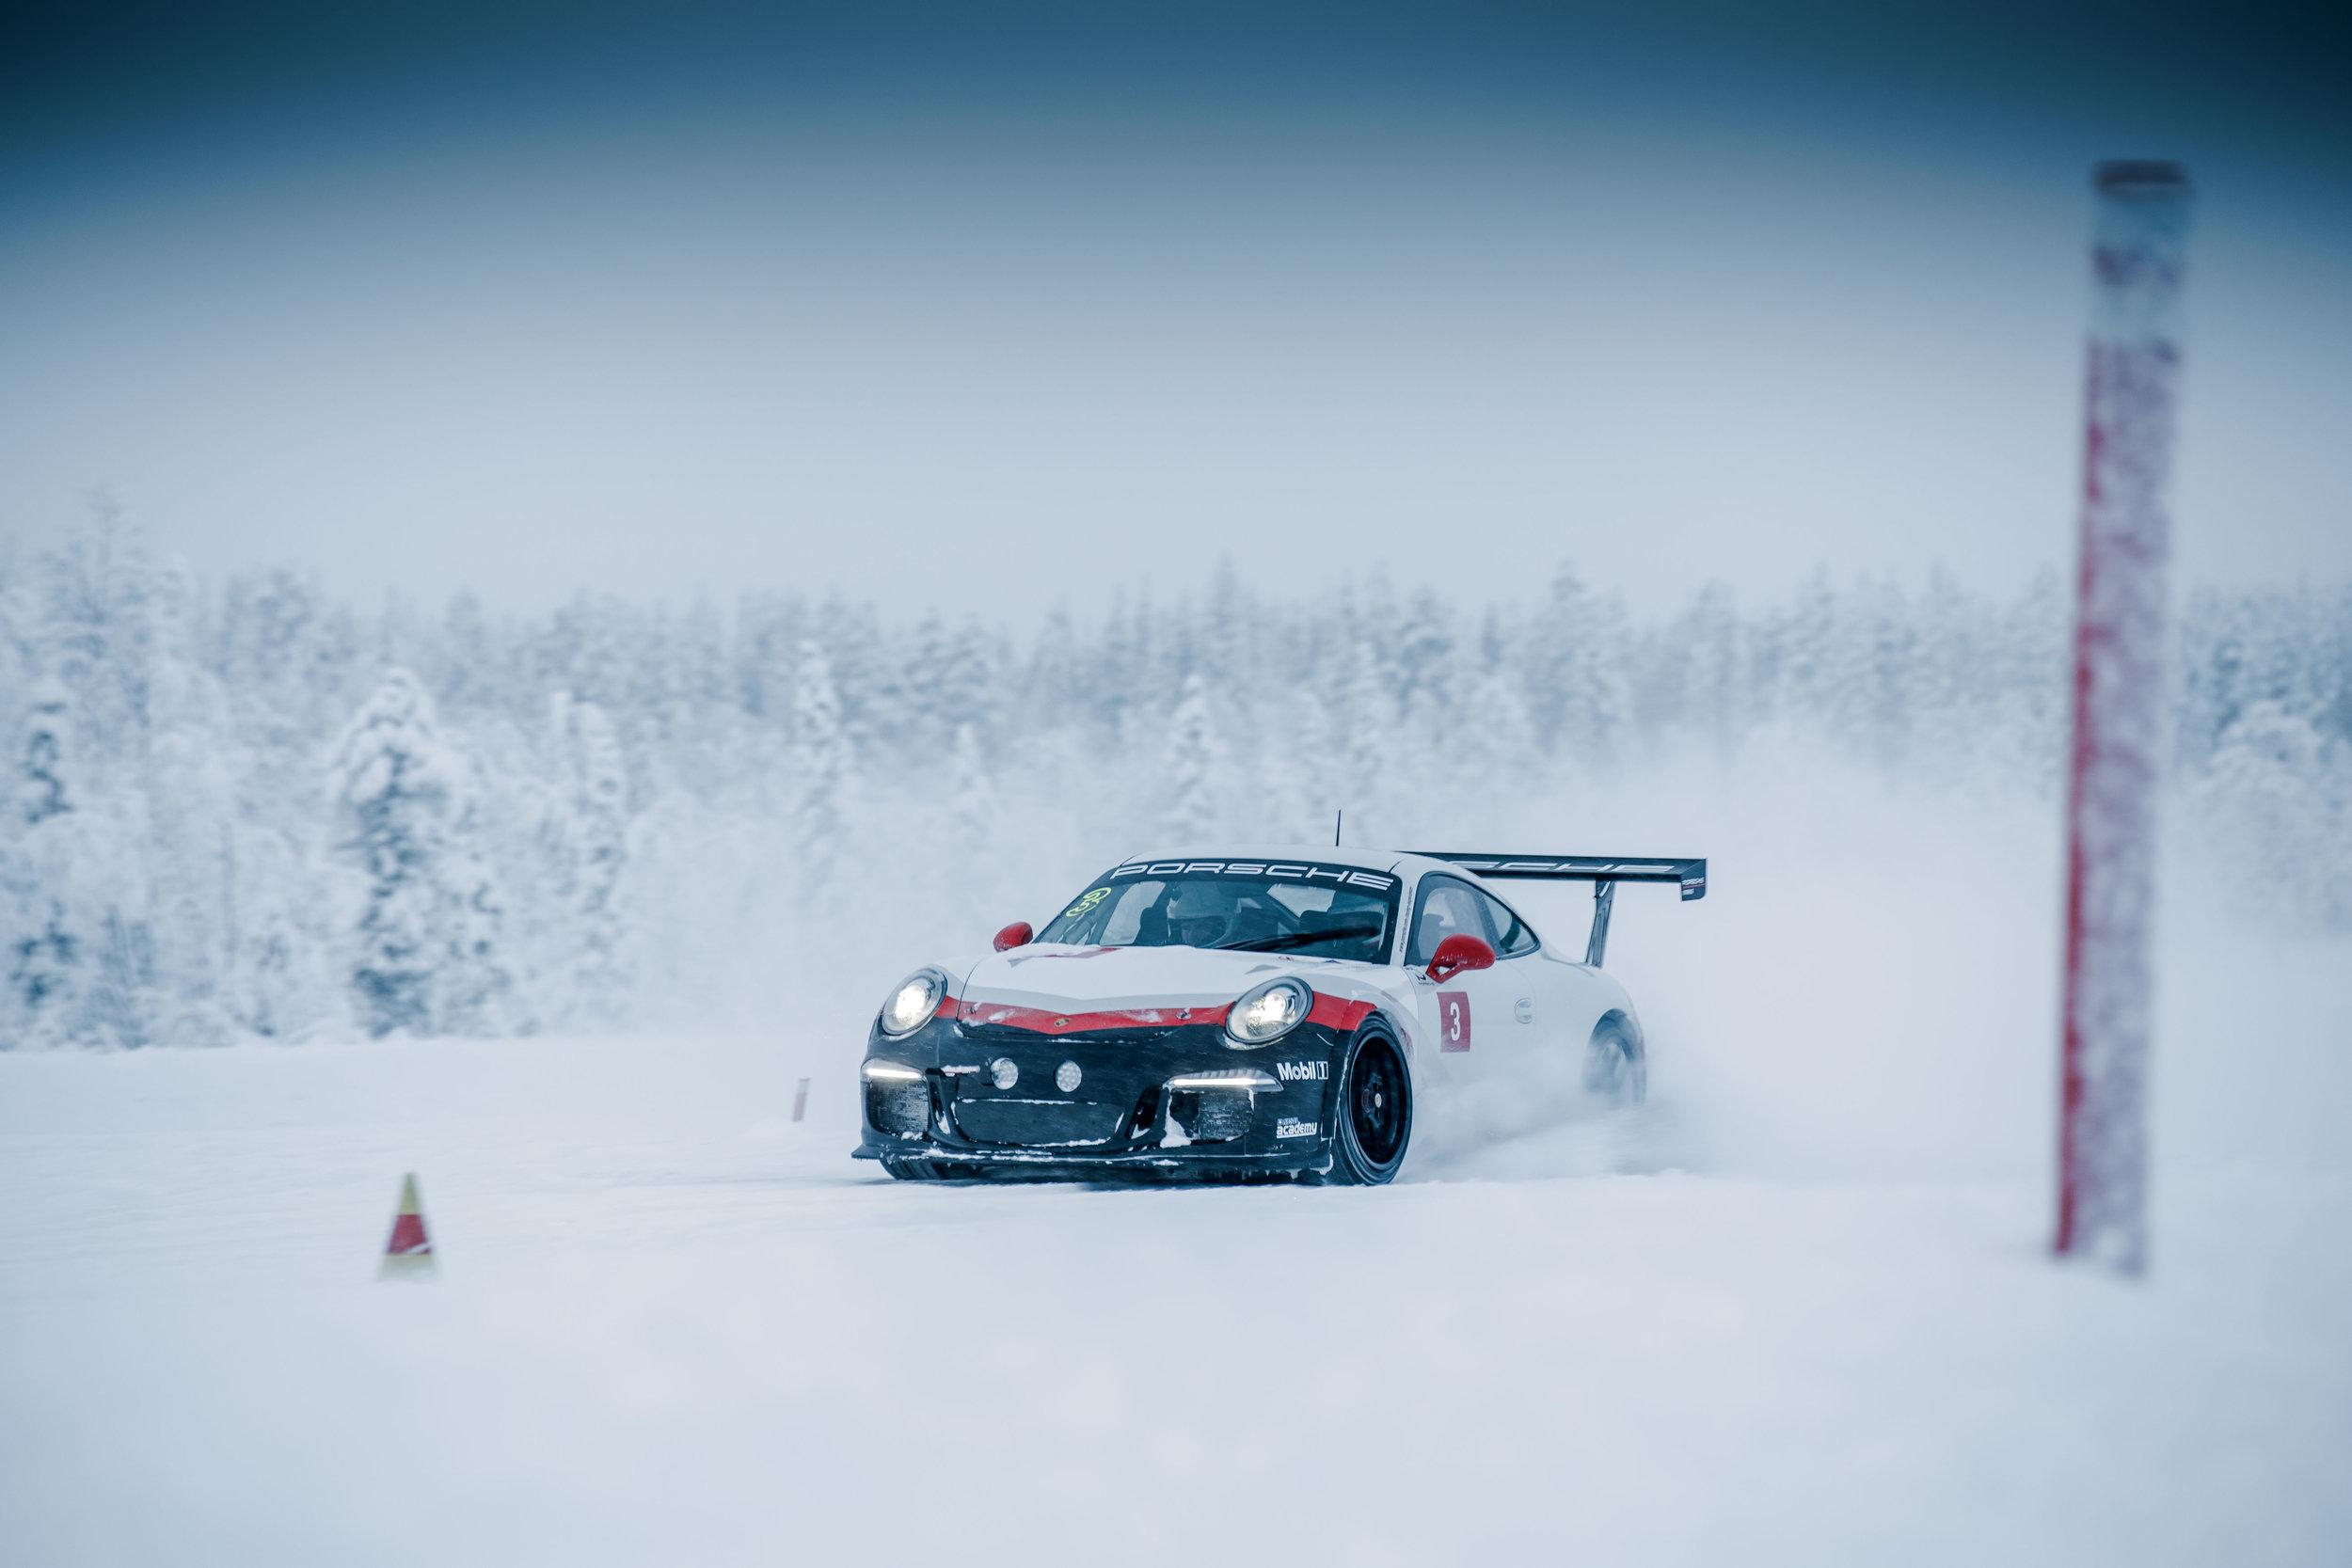 Porsche Ice Experience on Ice_30_01_2019_0410_175674.jpg